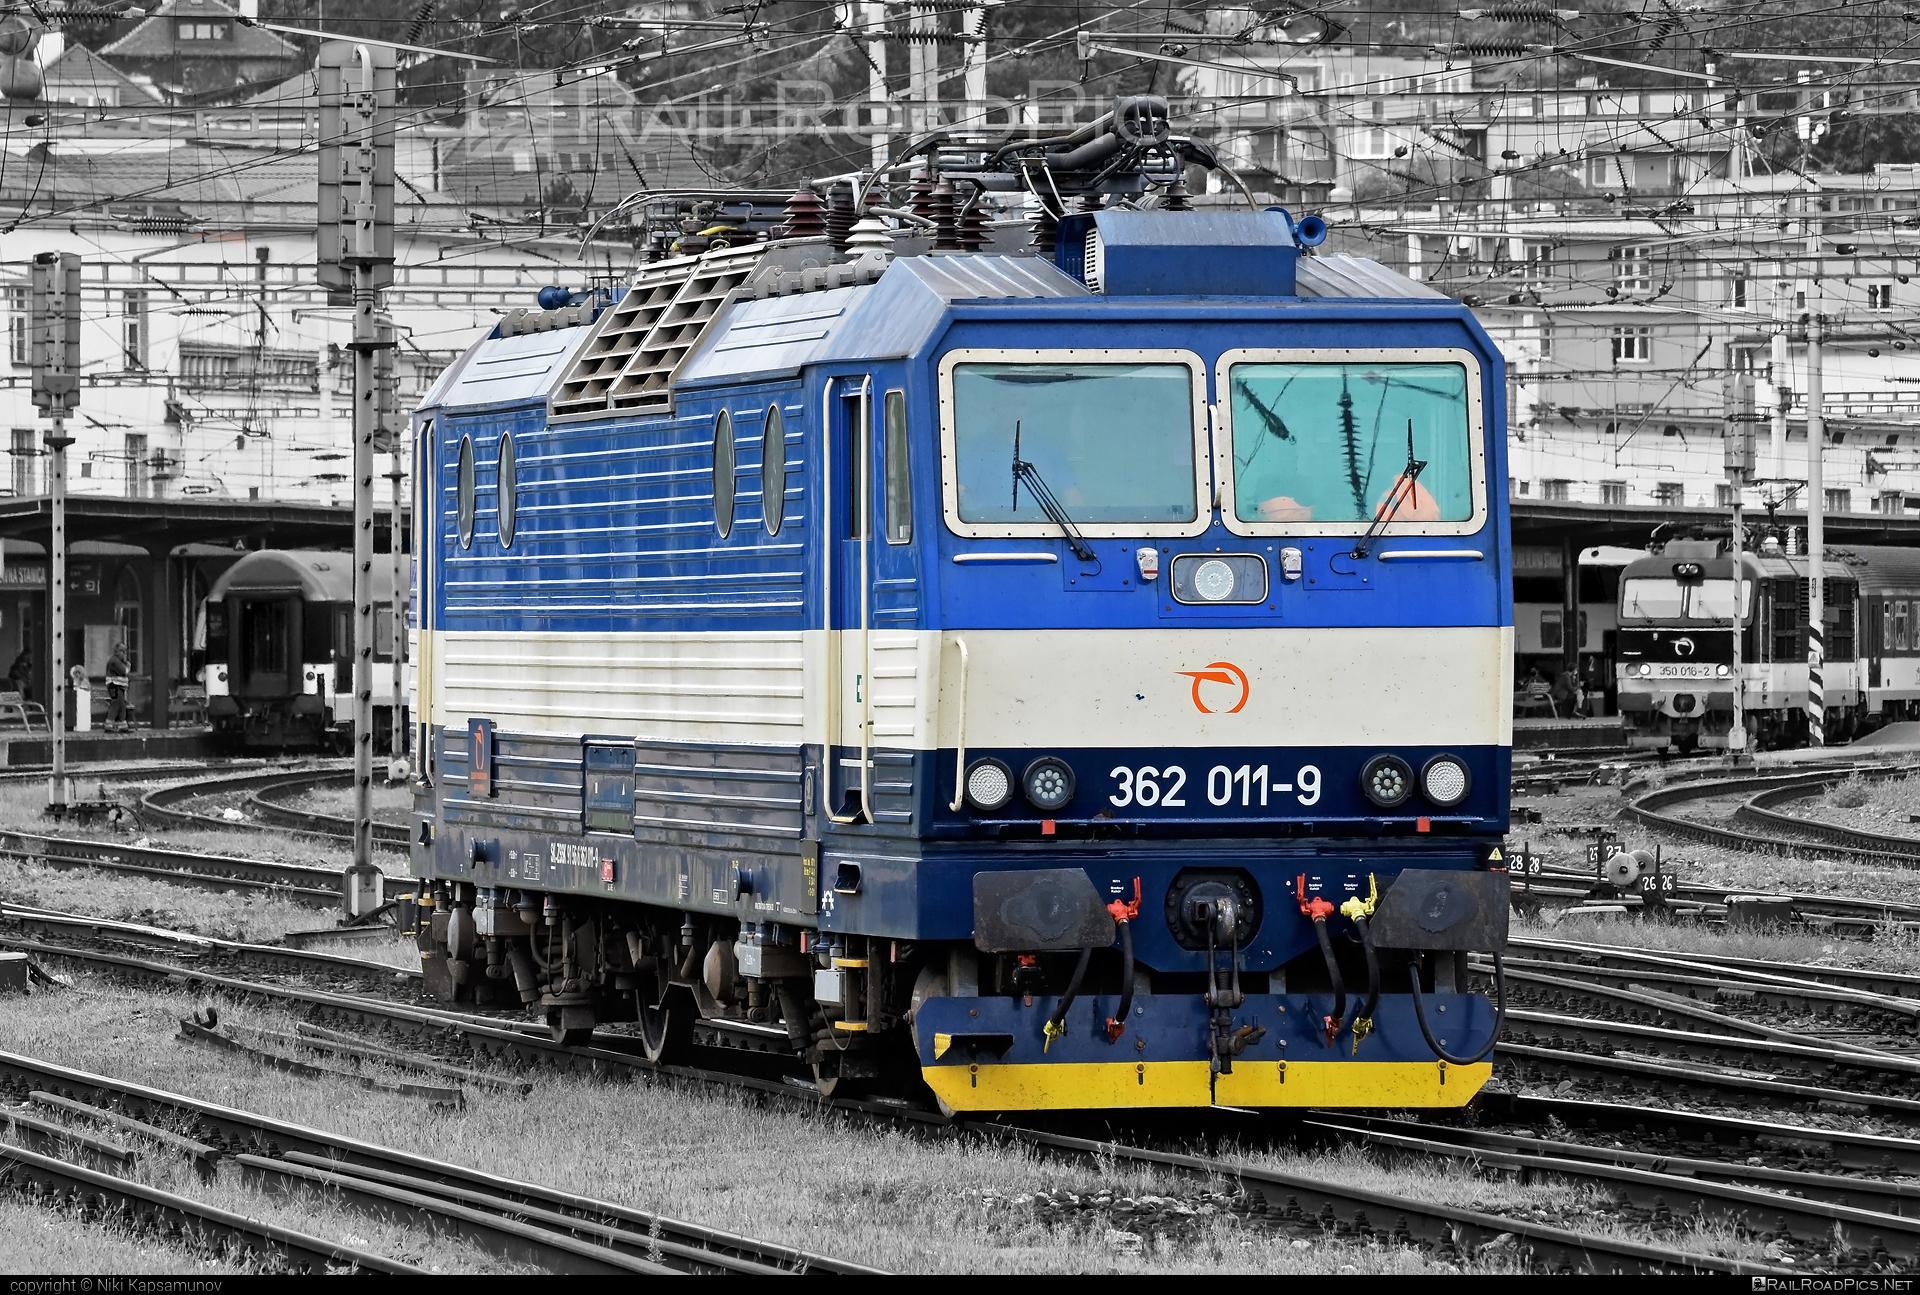 Škoda 69Er - 362 011-9 operated by Železničná Spoločnost' Slovensko, a.s. #ZeleznicnaSpolocnostSlovensko #eso #locomotive362 #rychleeso #skoda #skoda69er #zssk